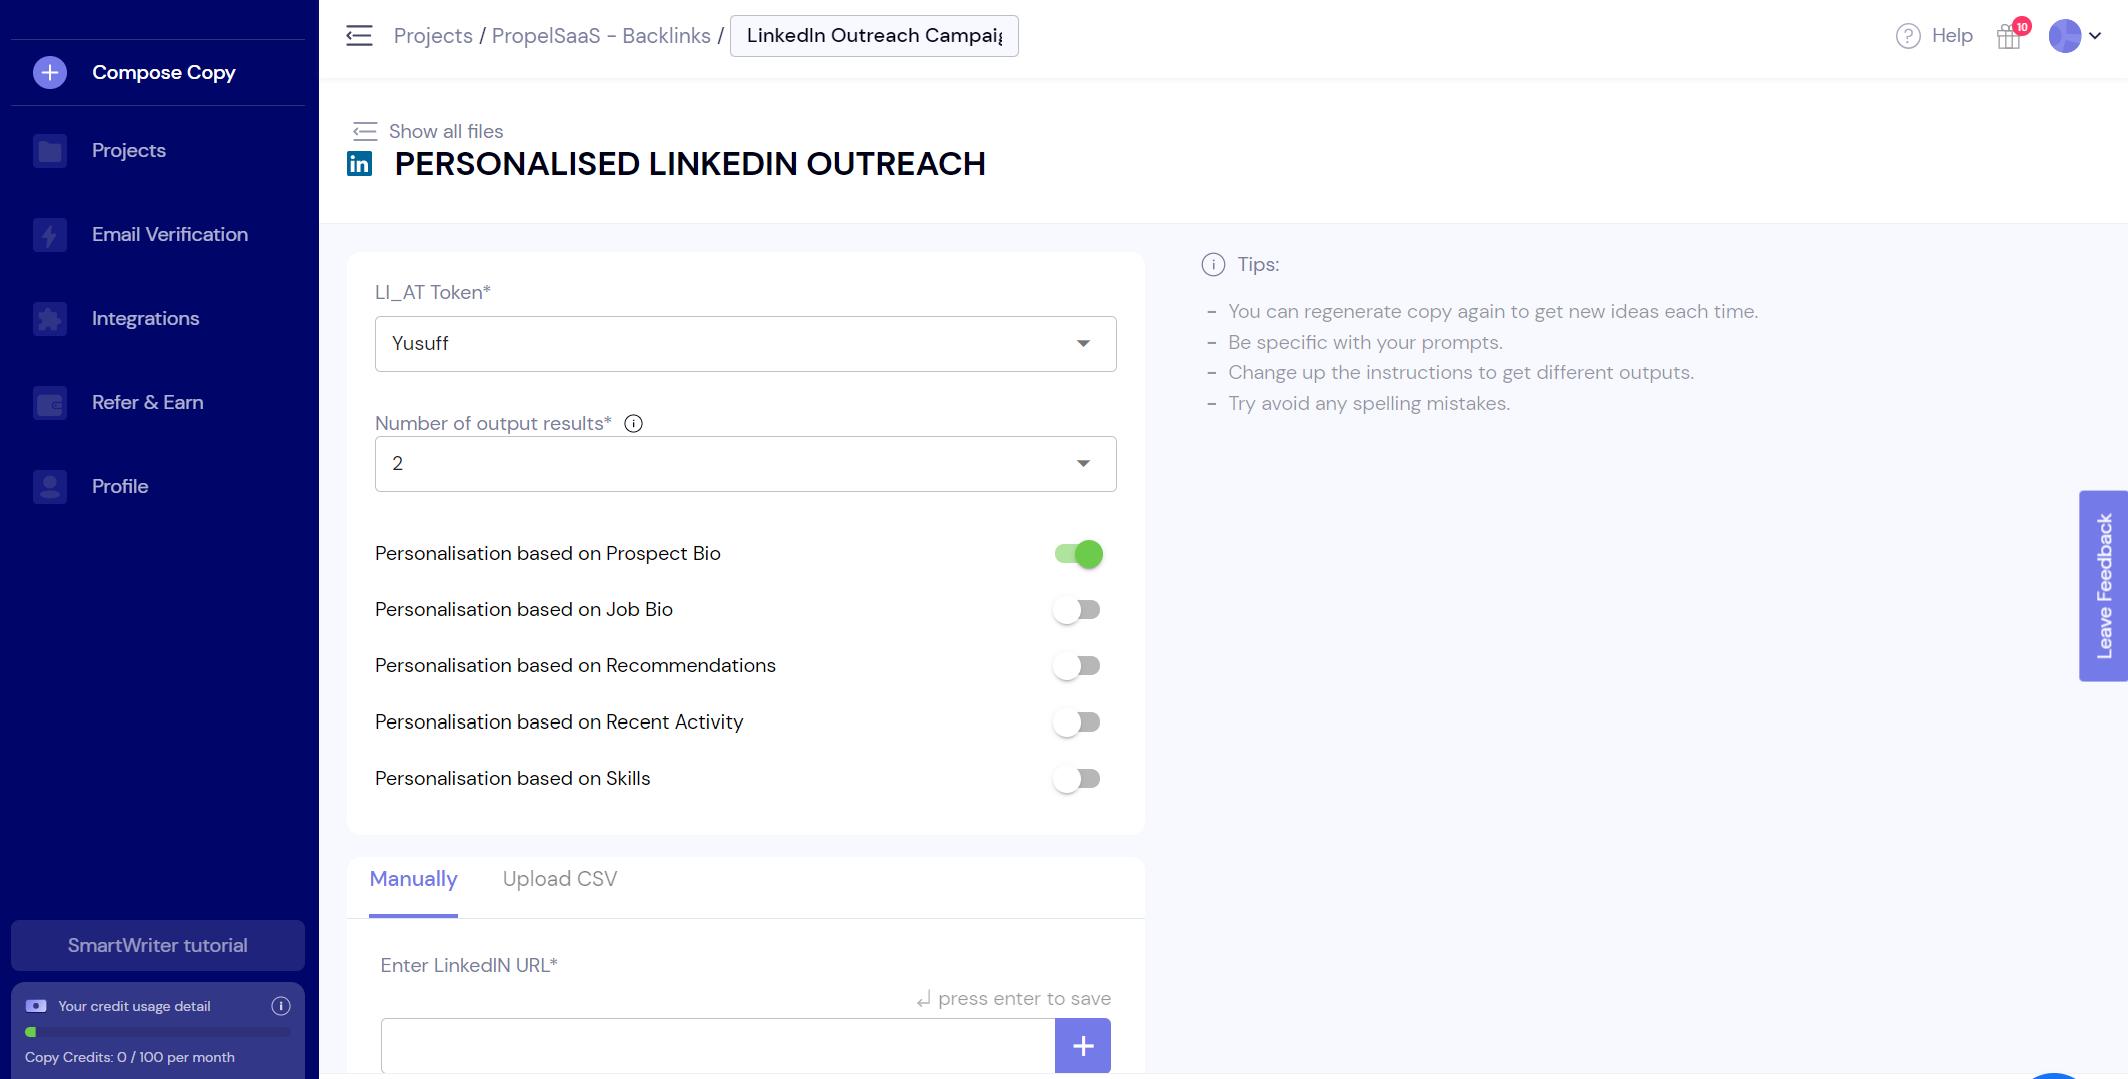 SmartWriter - LinkedIn Outreach